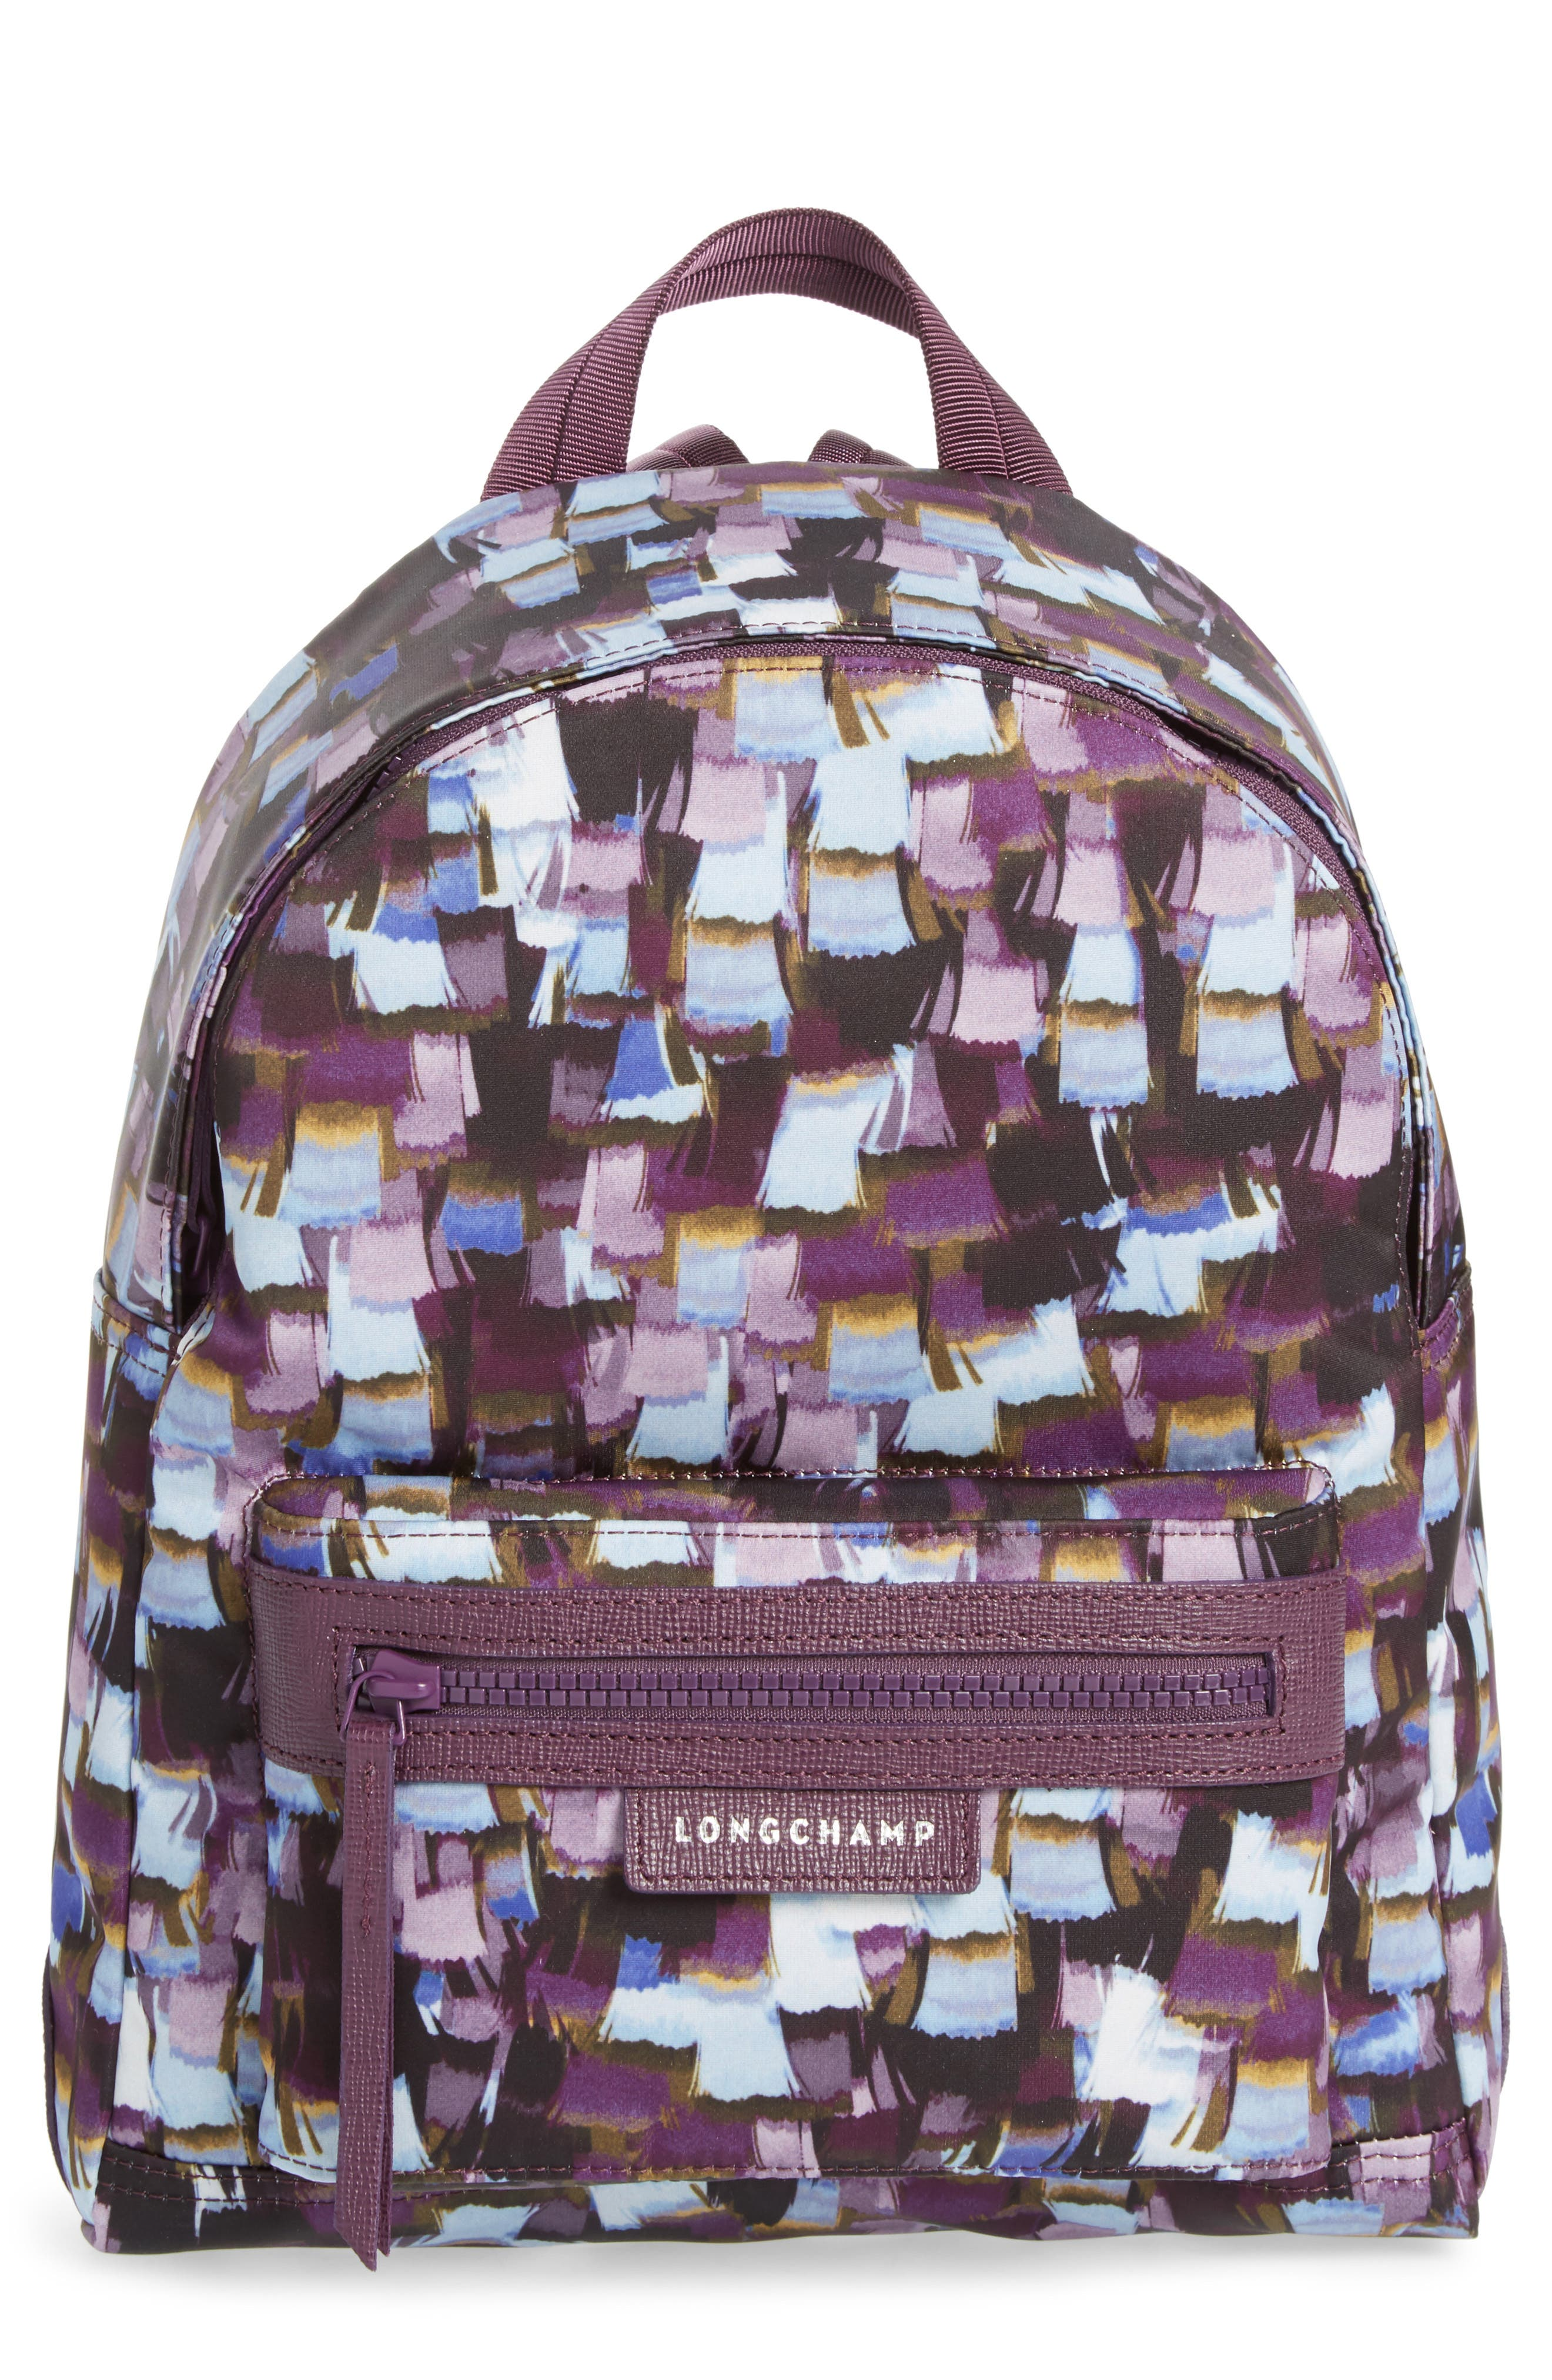 Main Image - Longchamp Le Pliage Neo - Vibrations Nylon Backpack